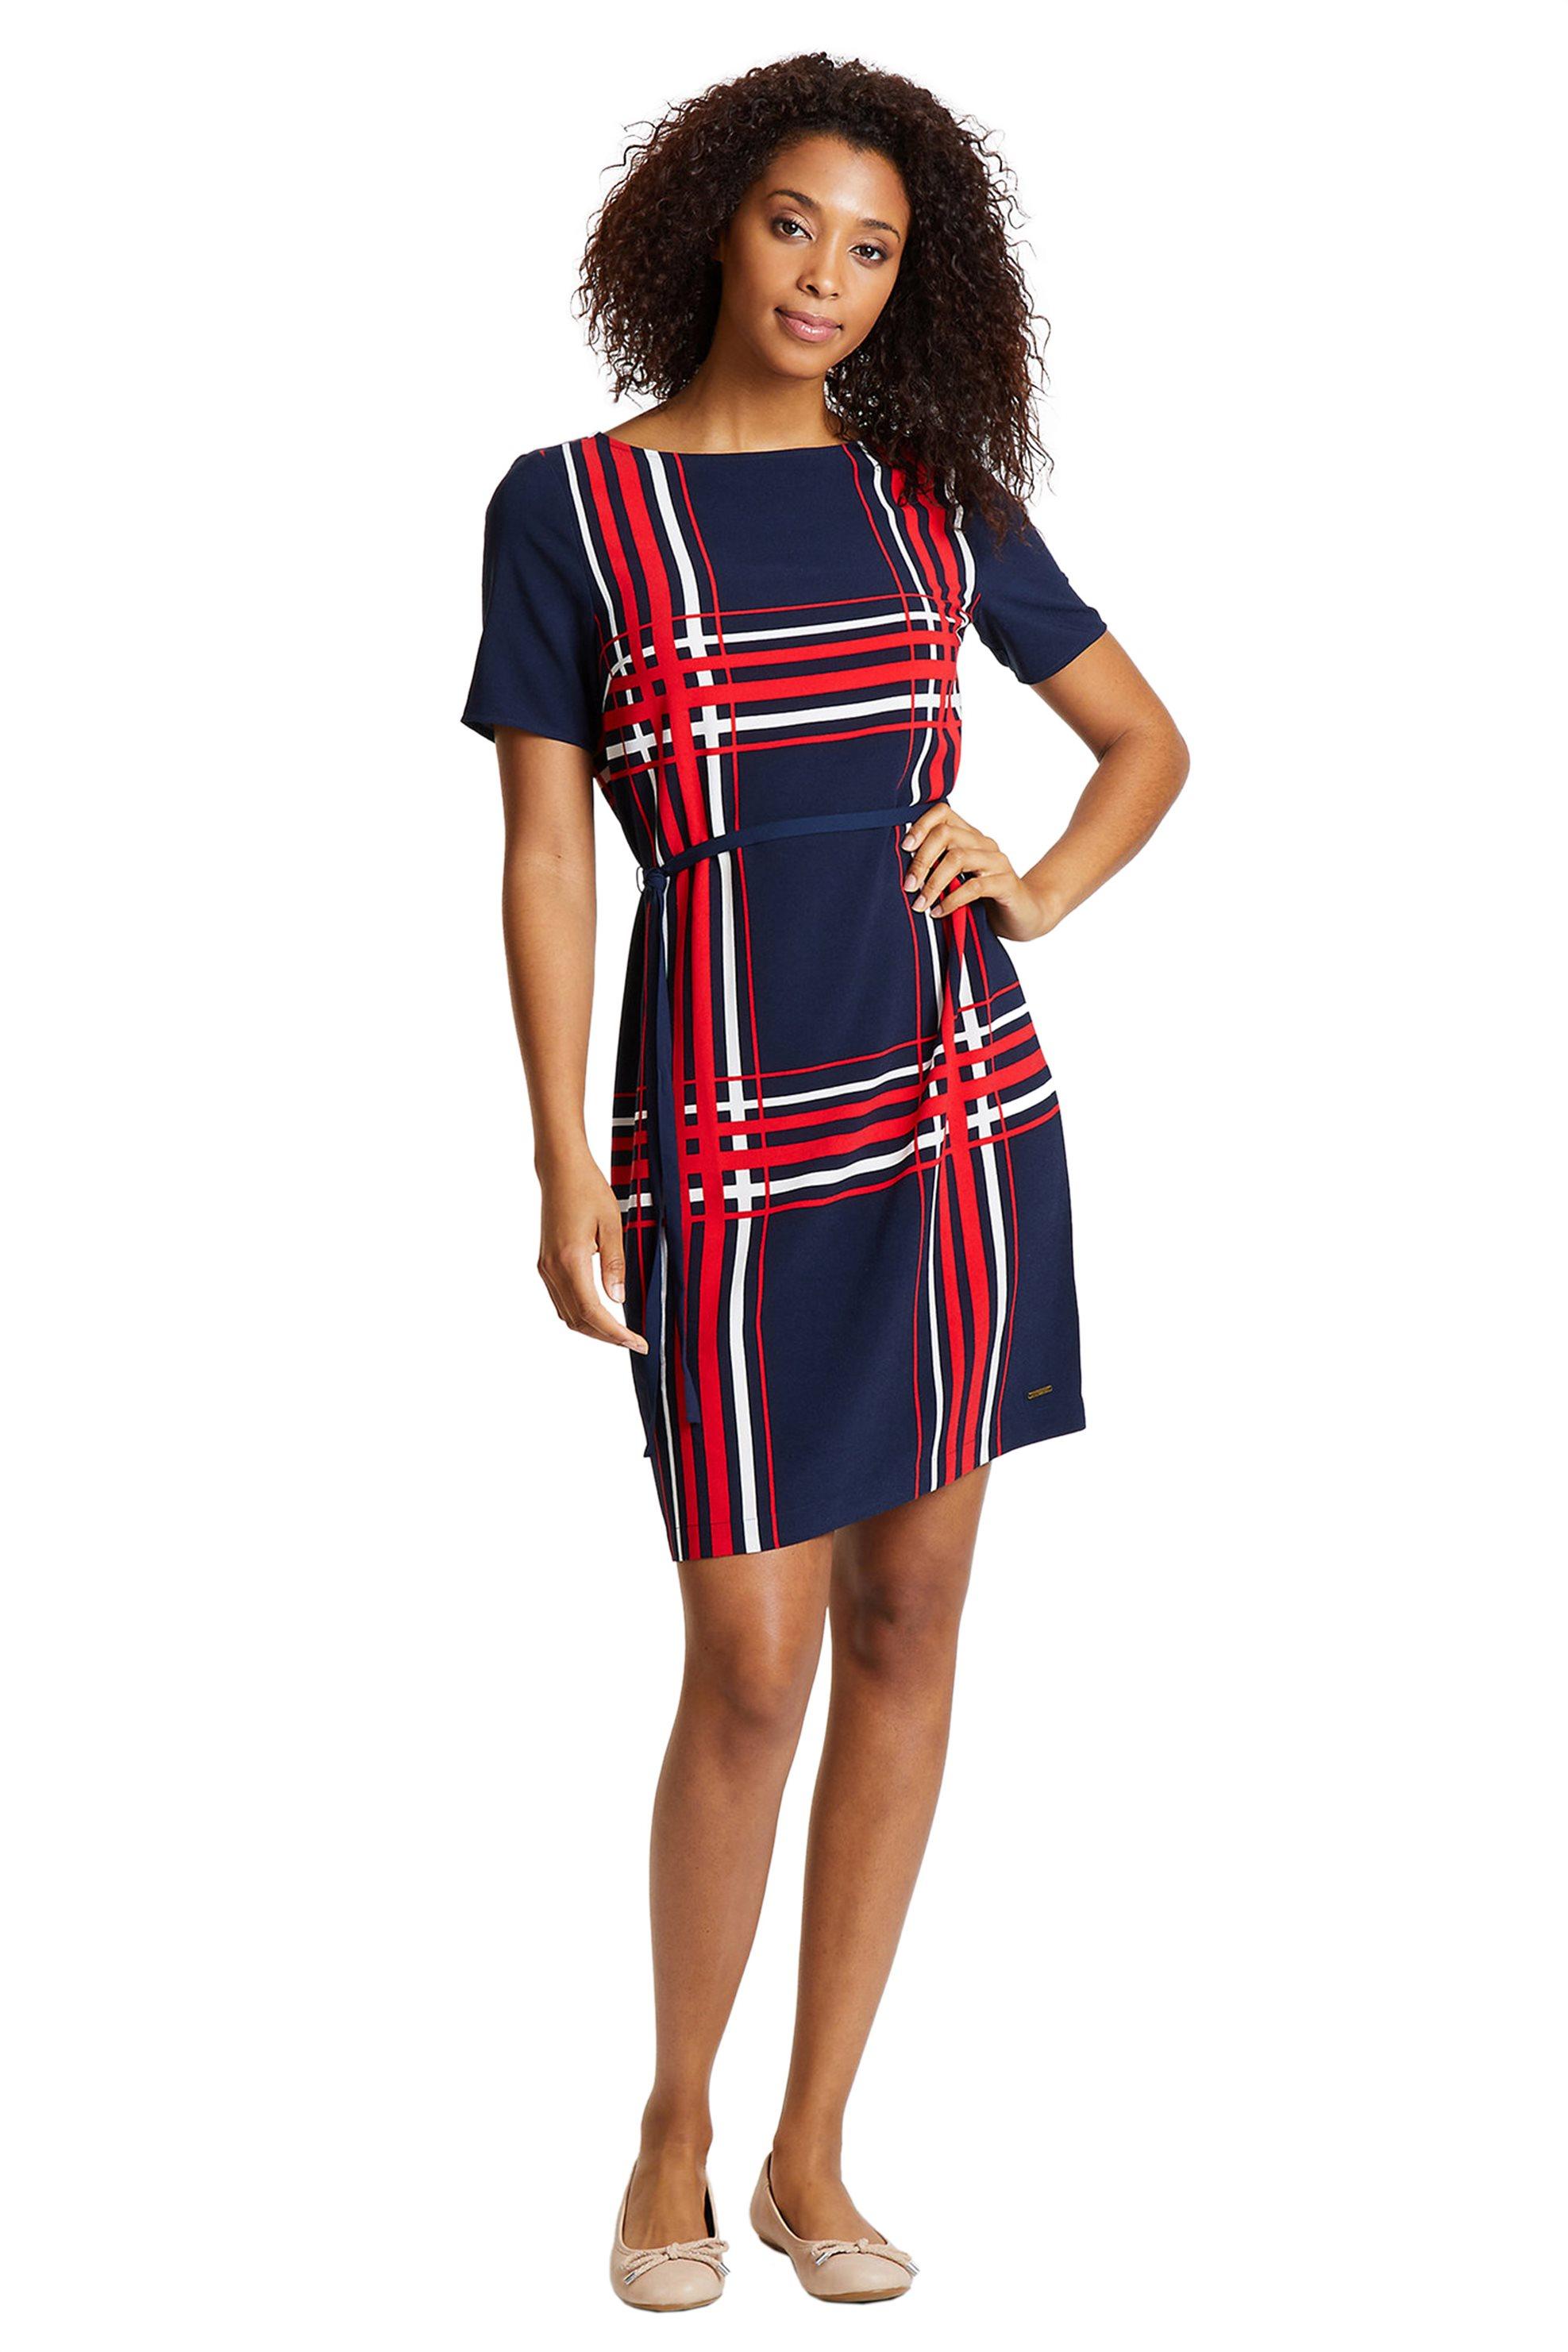 Nautica γυναικείο mini φόρεμα με ριγέ σχέδιο και ζωνάκι - 84D212 - Μπλε Σκούρο γυναικα   ρουχα   φορέματα   mini φορέματα